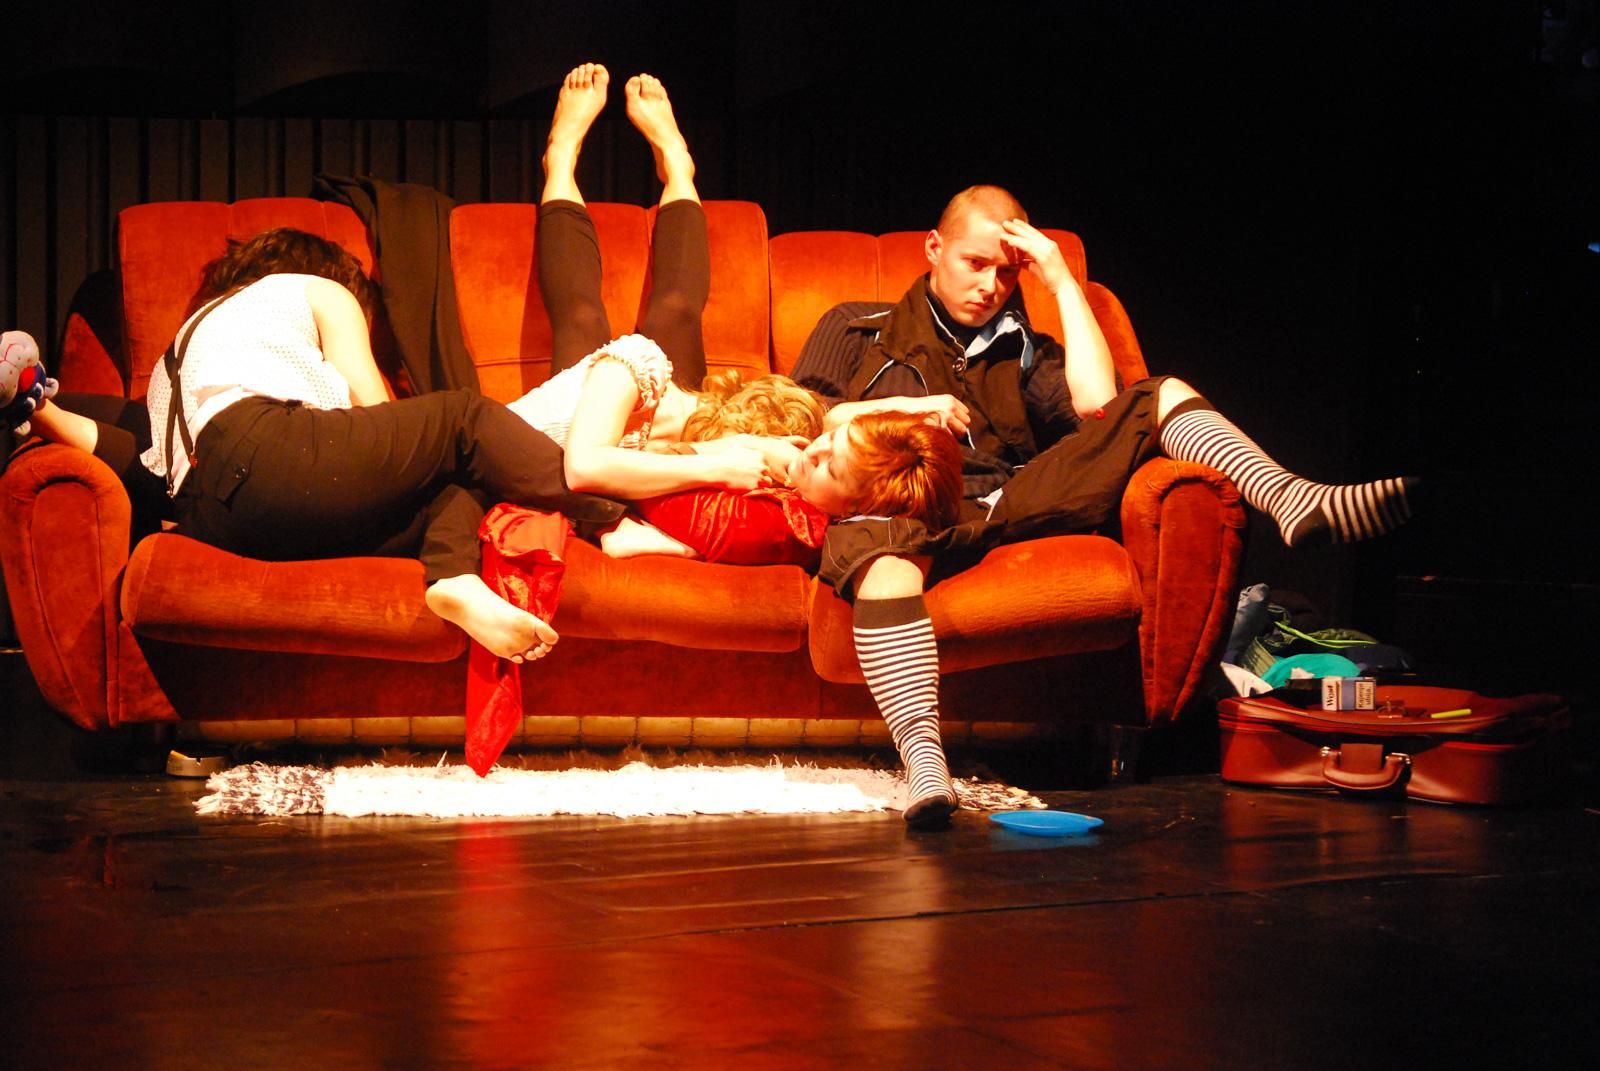 Teatro_Magico_Fantastico_15.jpg